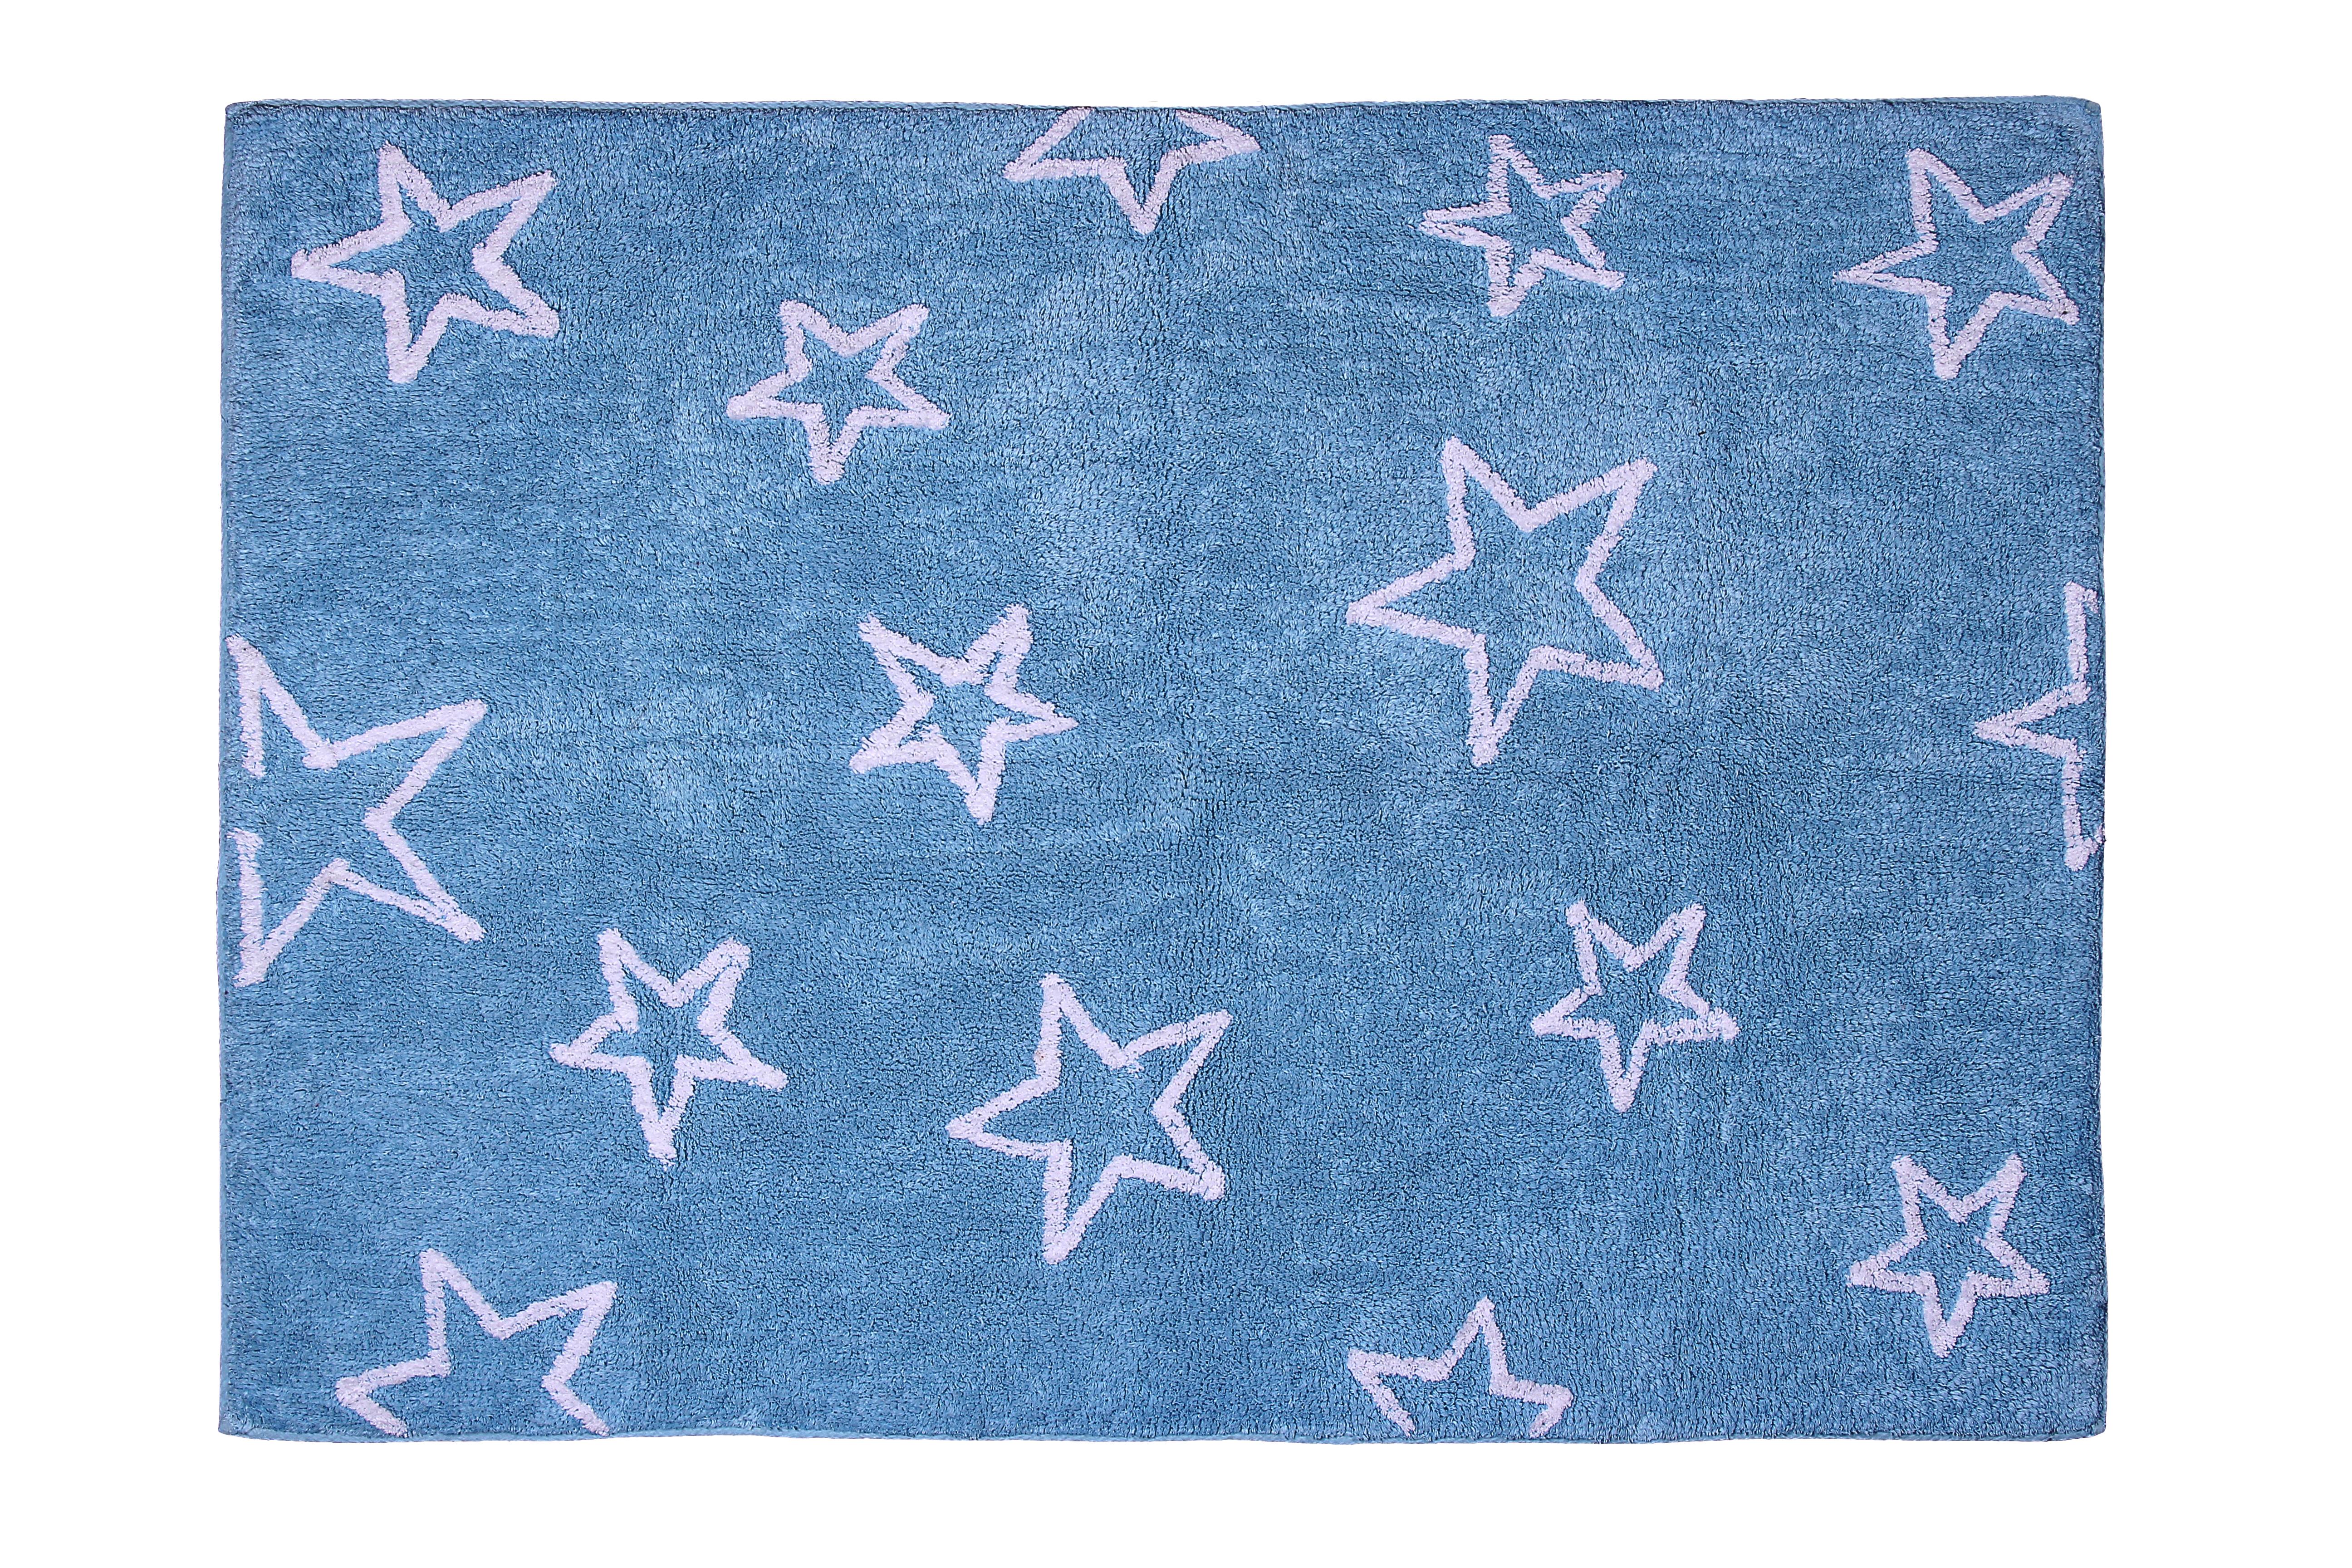 Estrellas Celeste